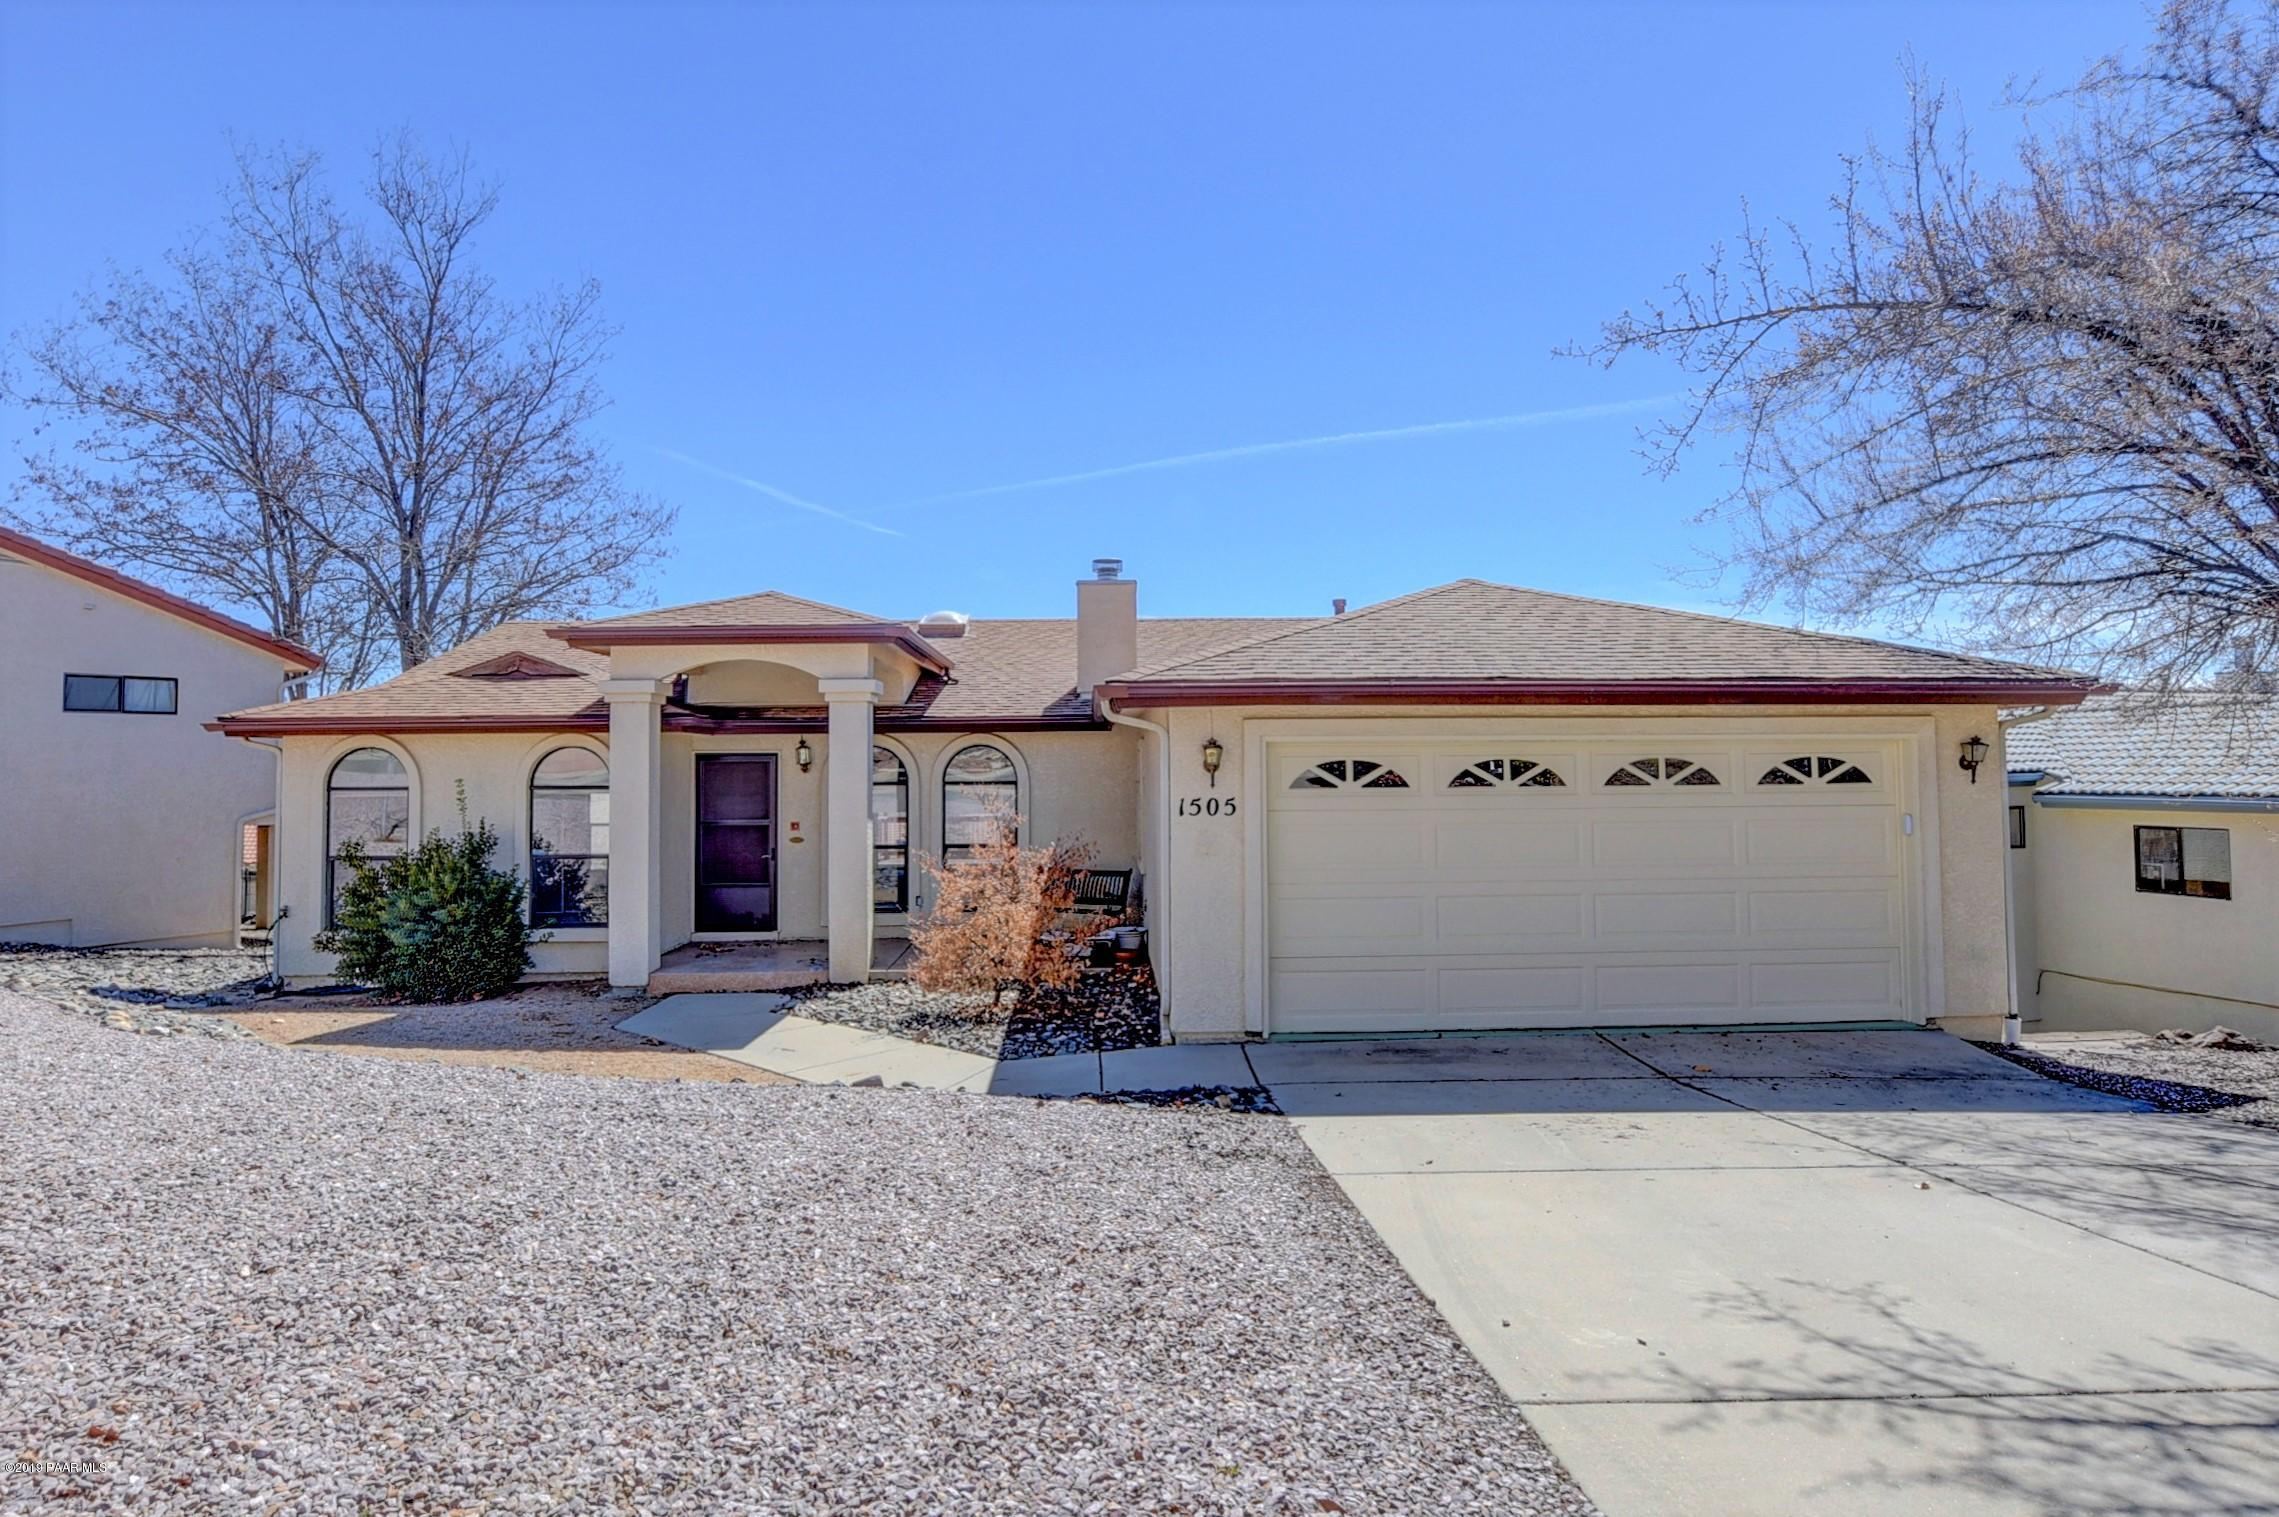 Photo of 1505 Marvin Gardens, Prescott, AZ 86301